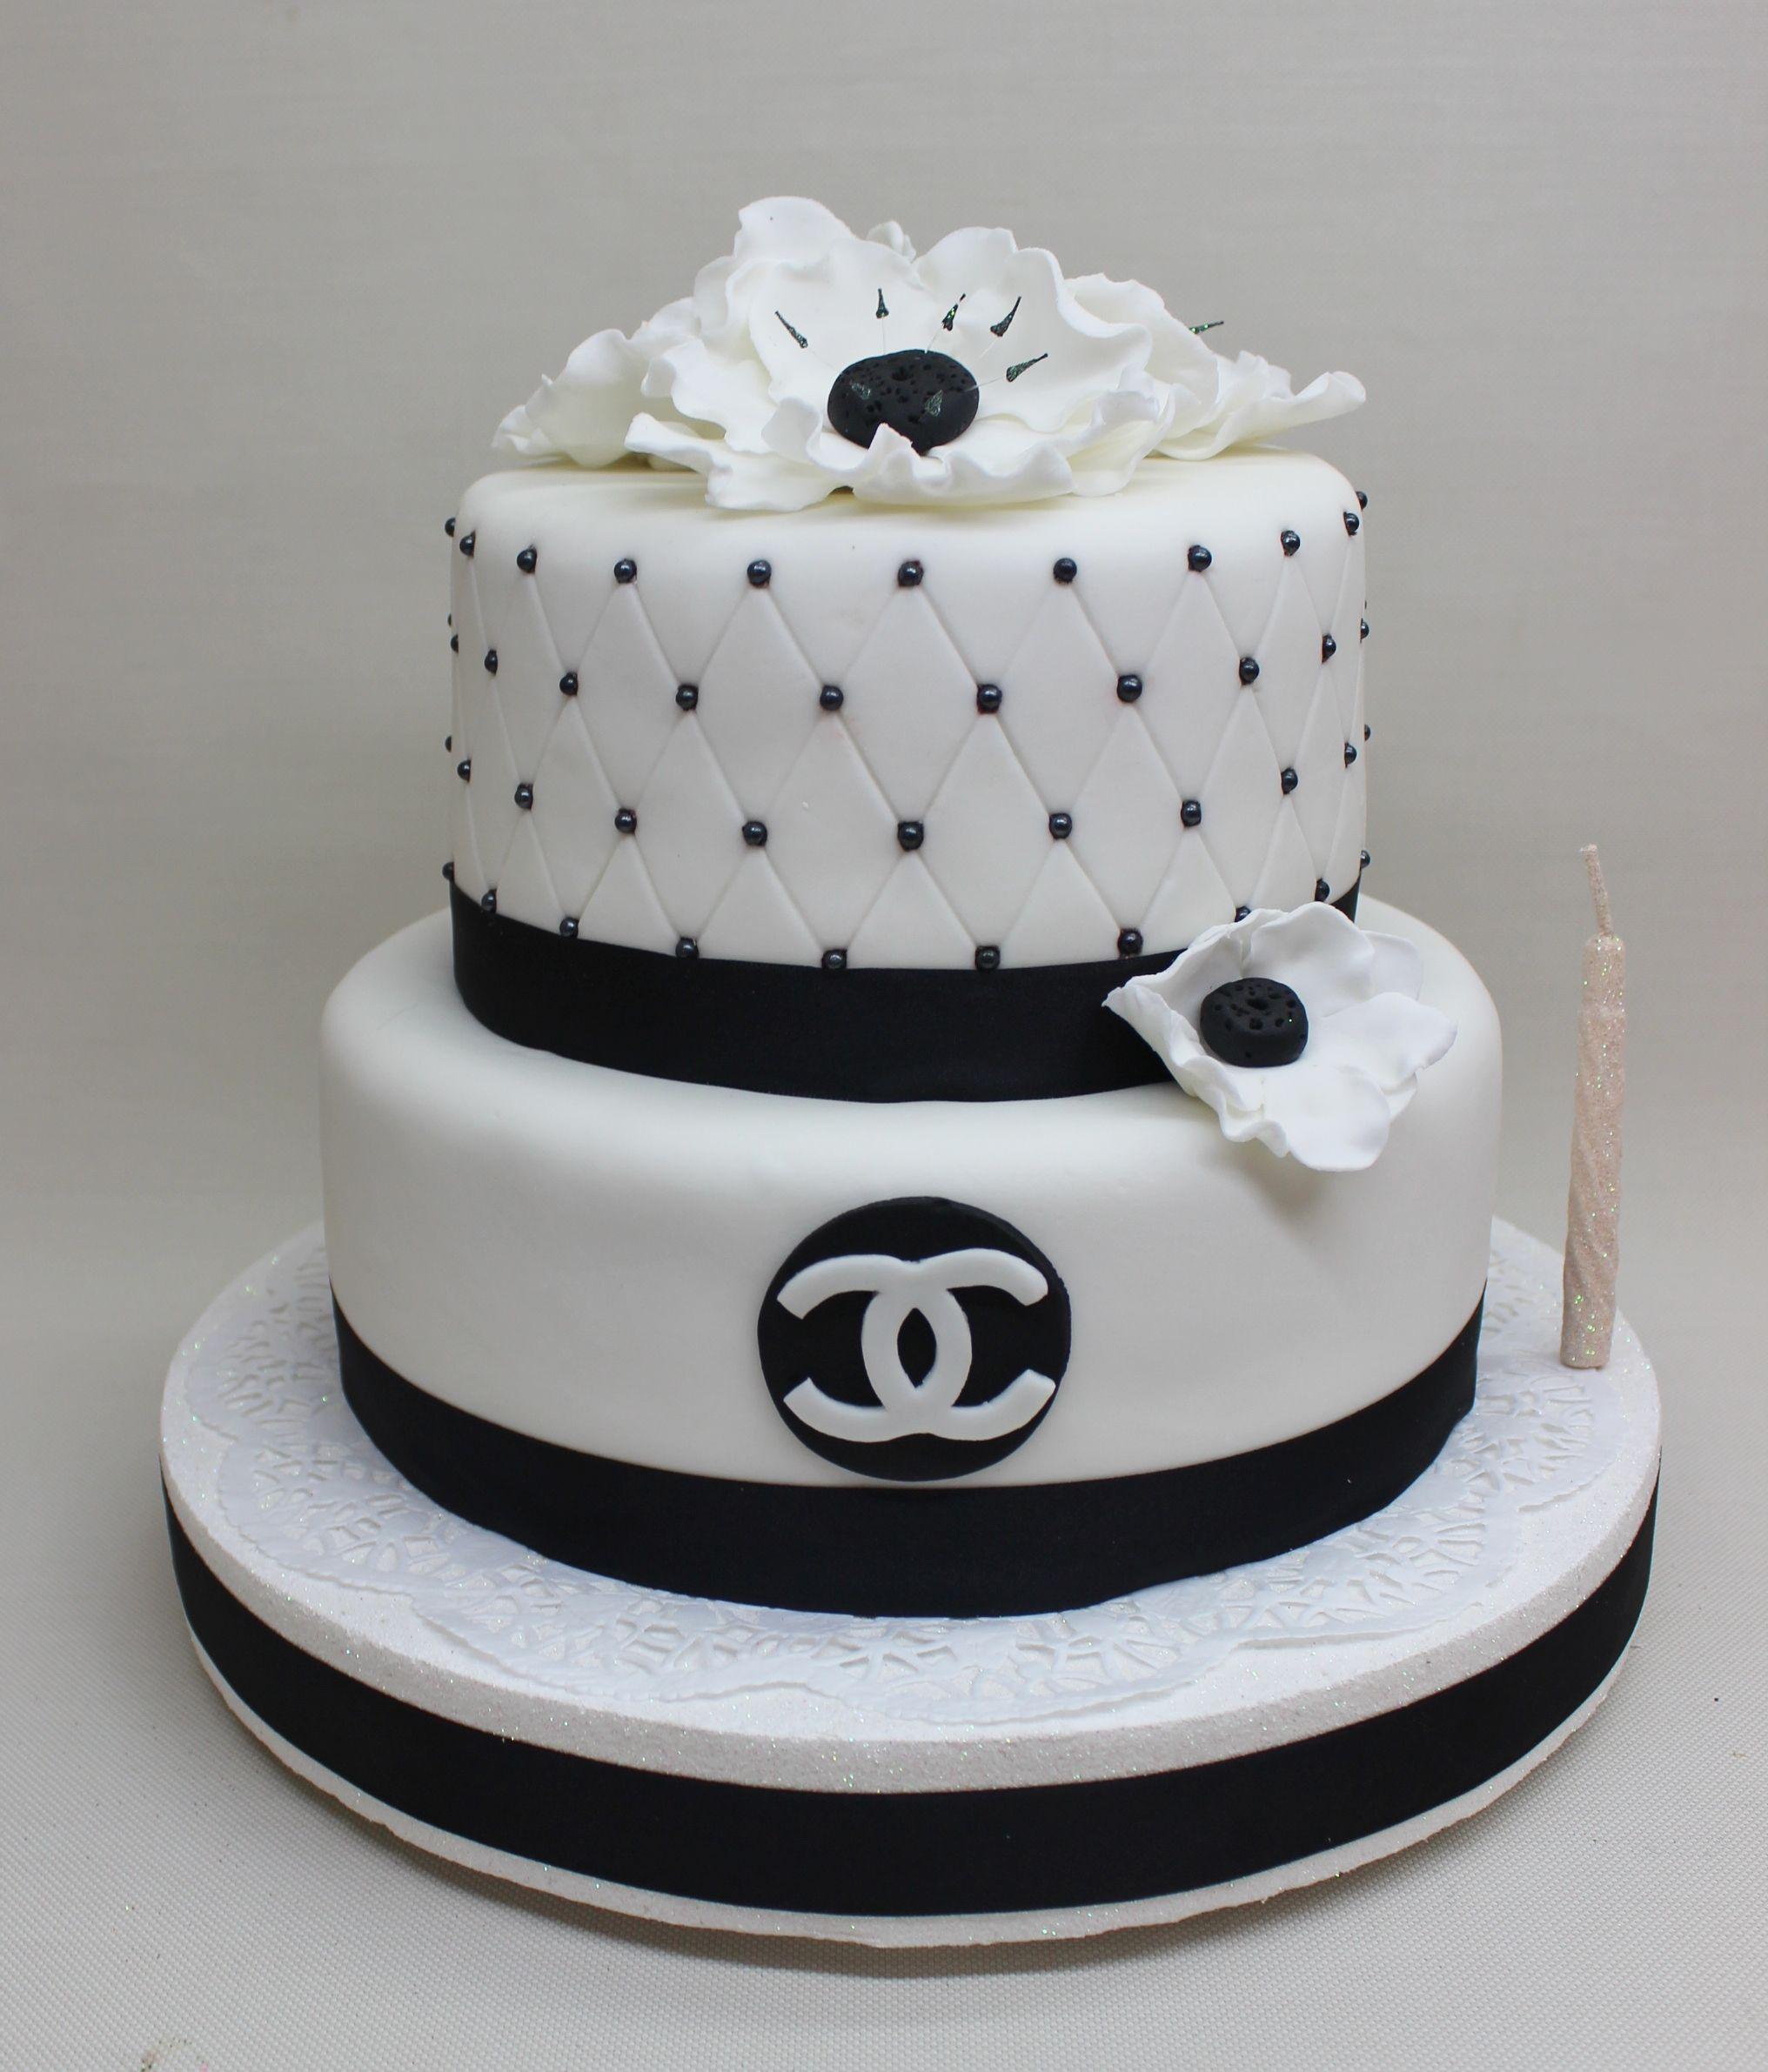 Chanel cake by violeta glace chanel cake birthday cake